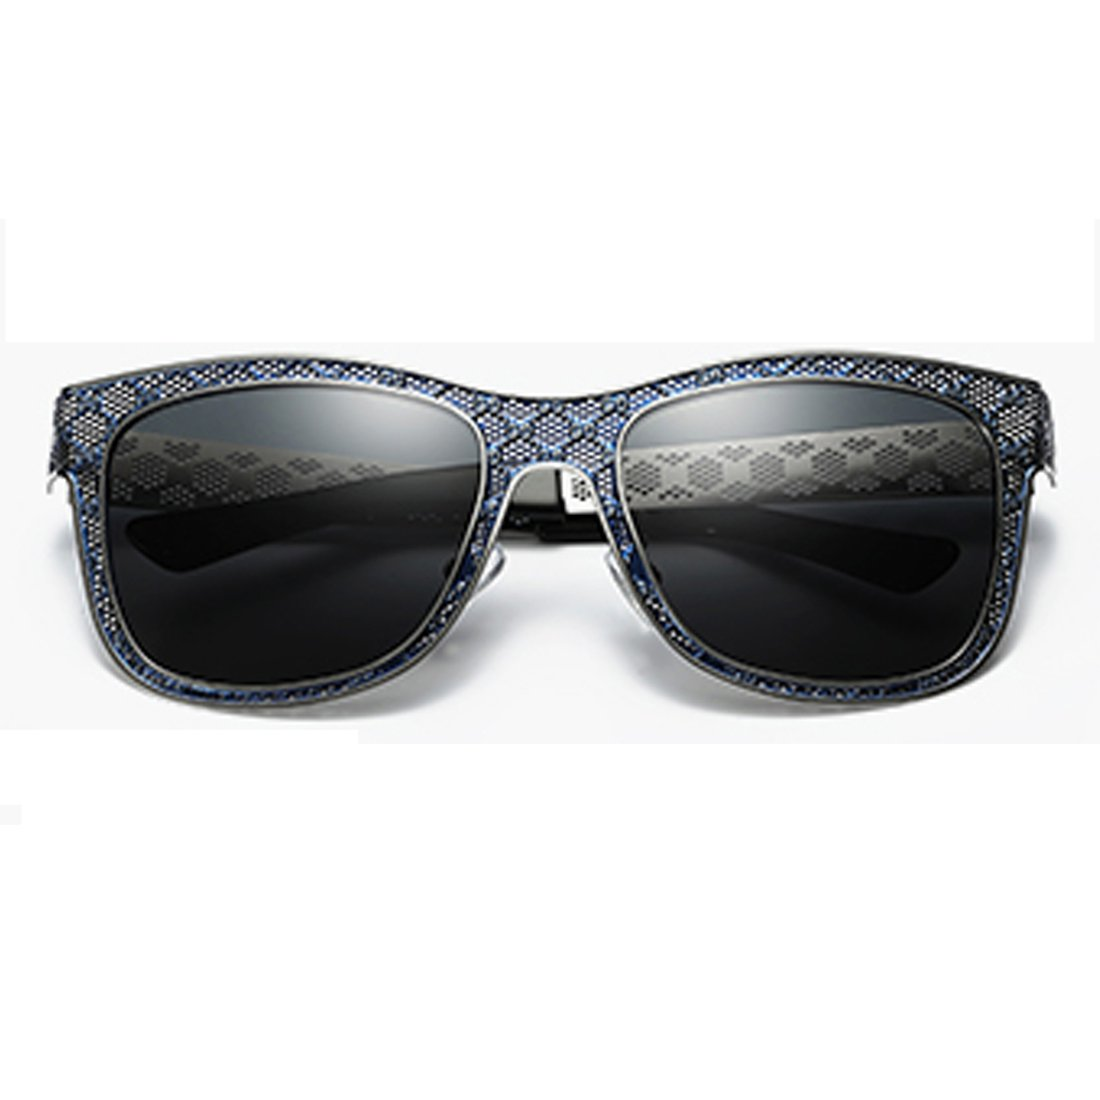 2a1e5216025 Wayfarer Style Sunglasses